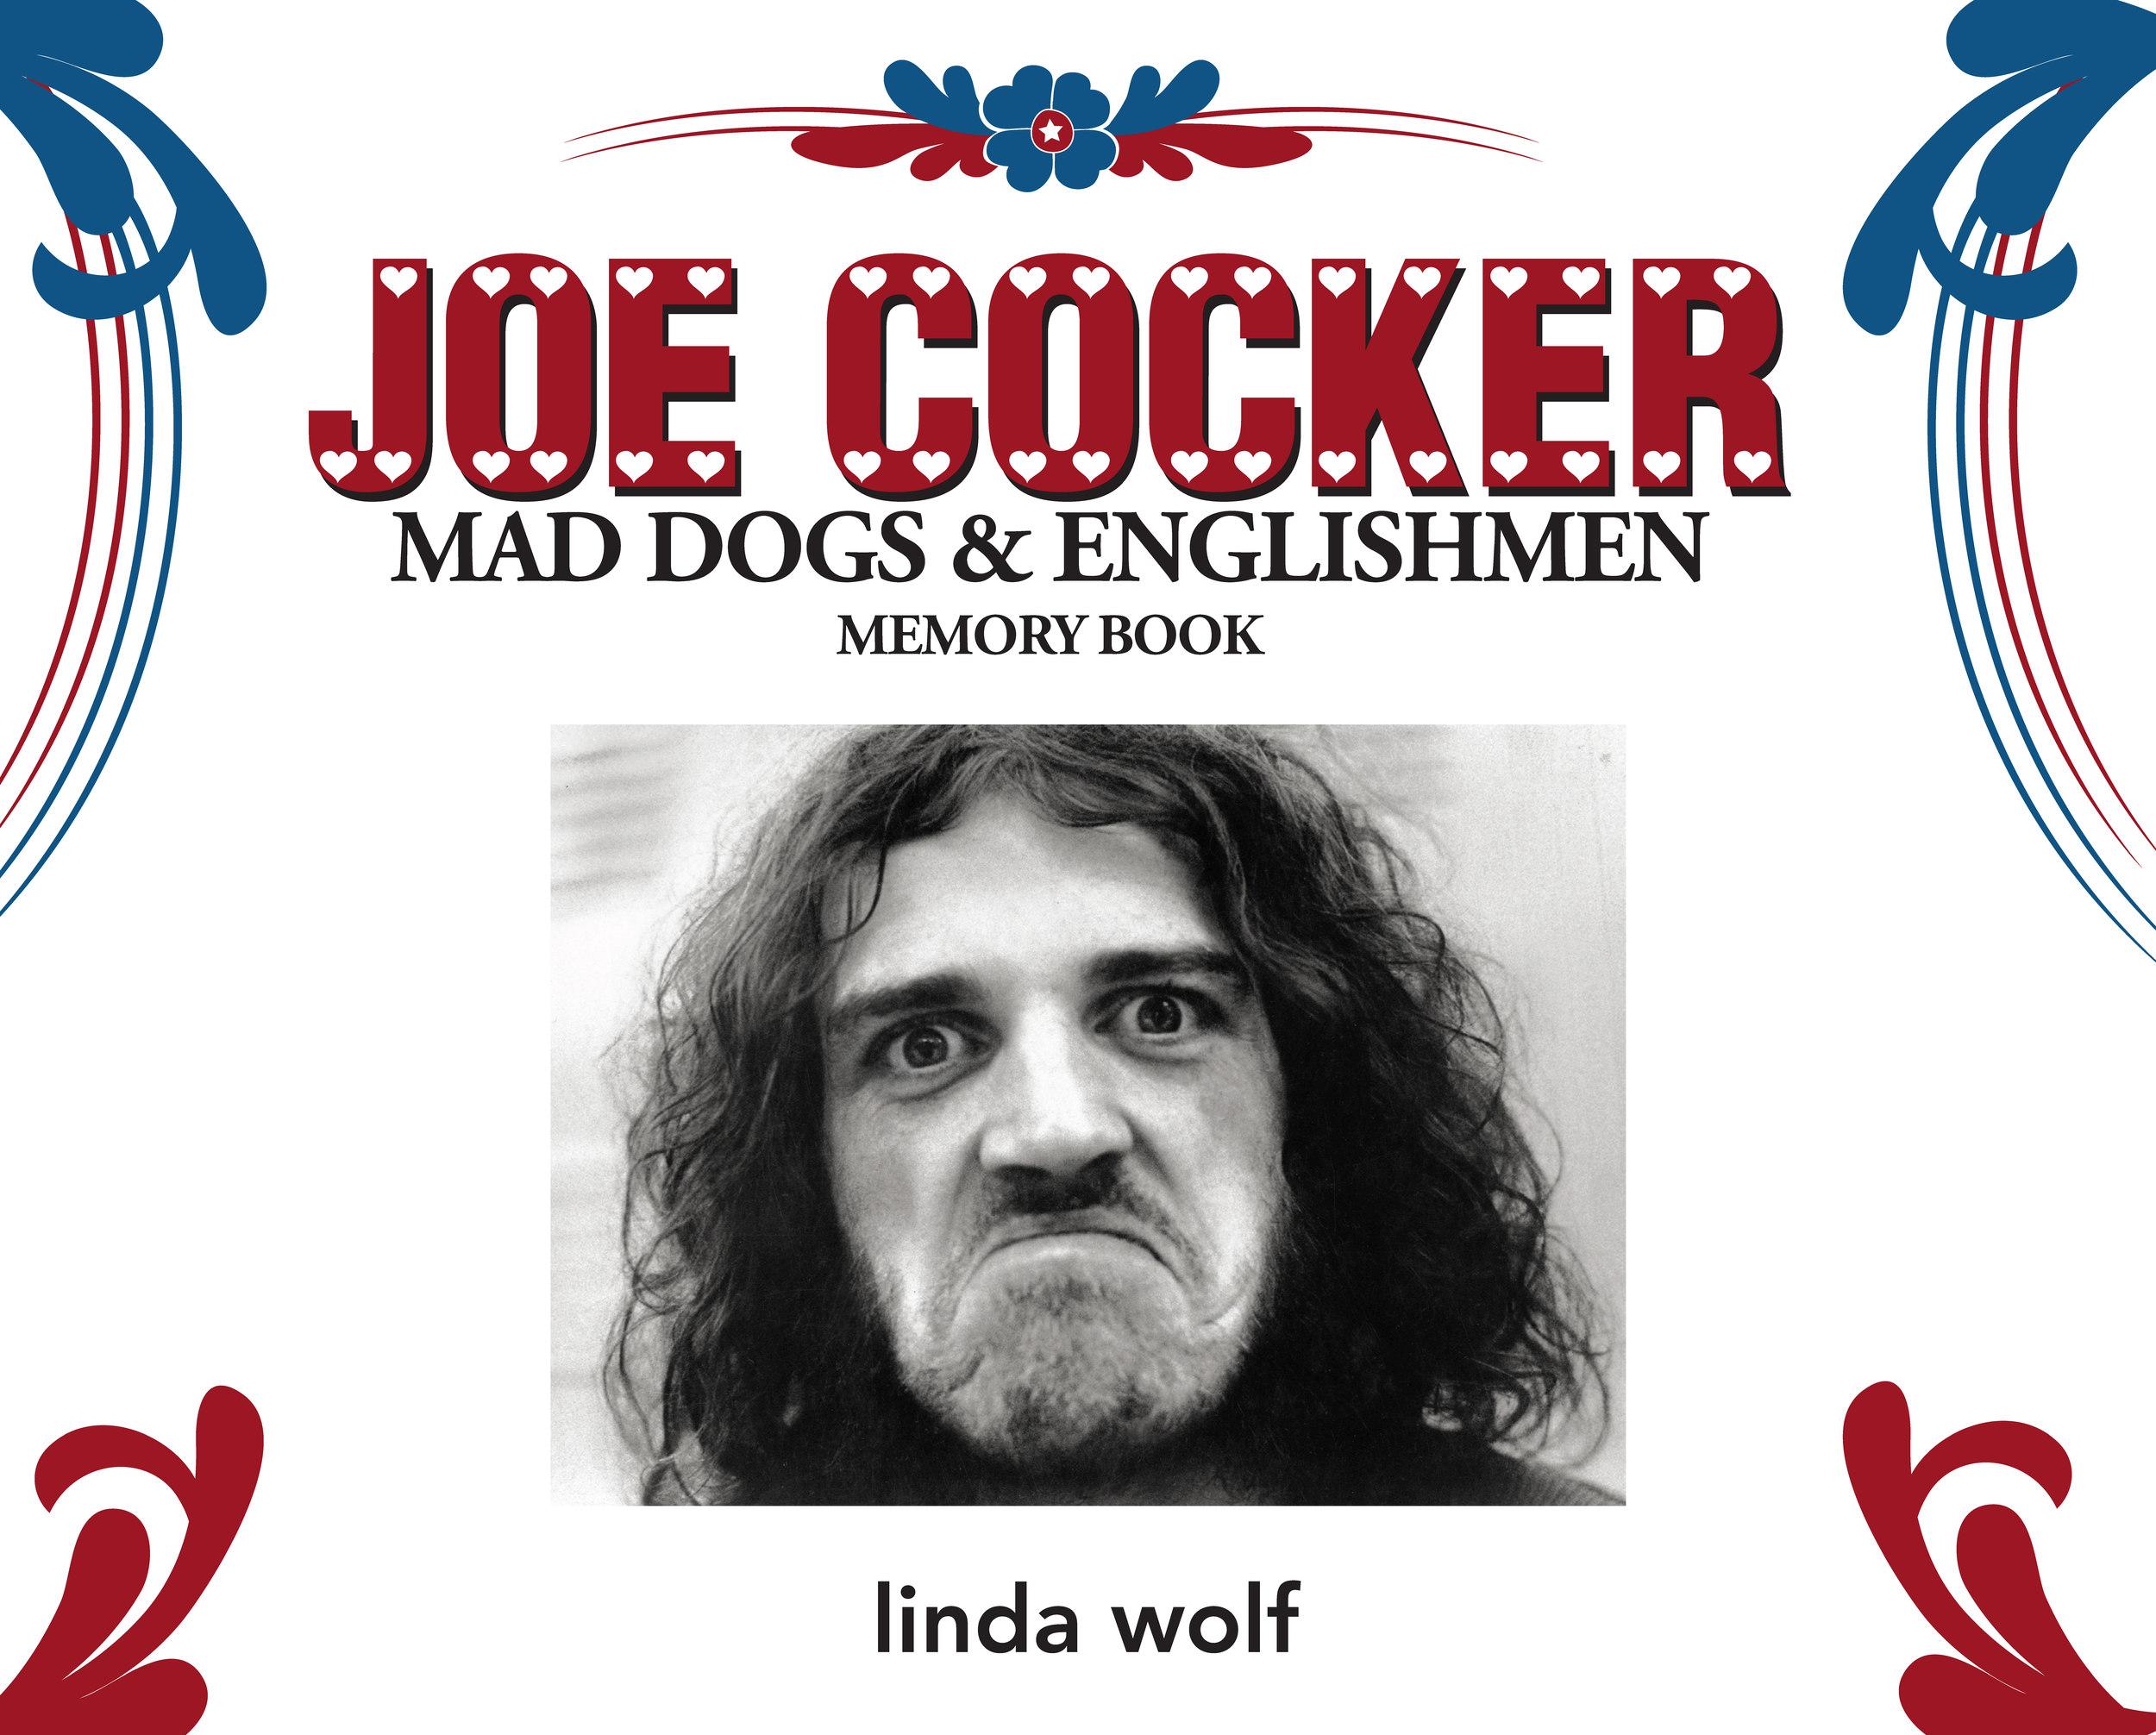 JoeCocker_Book_FRONT Cover.jpg